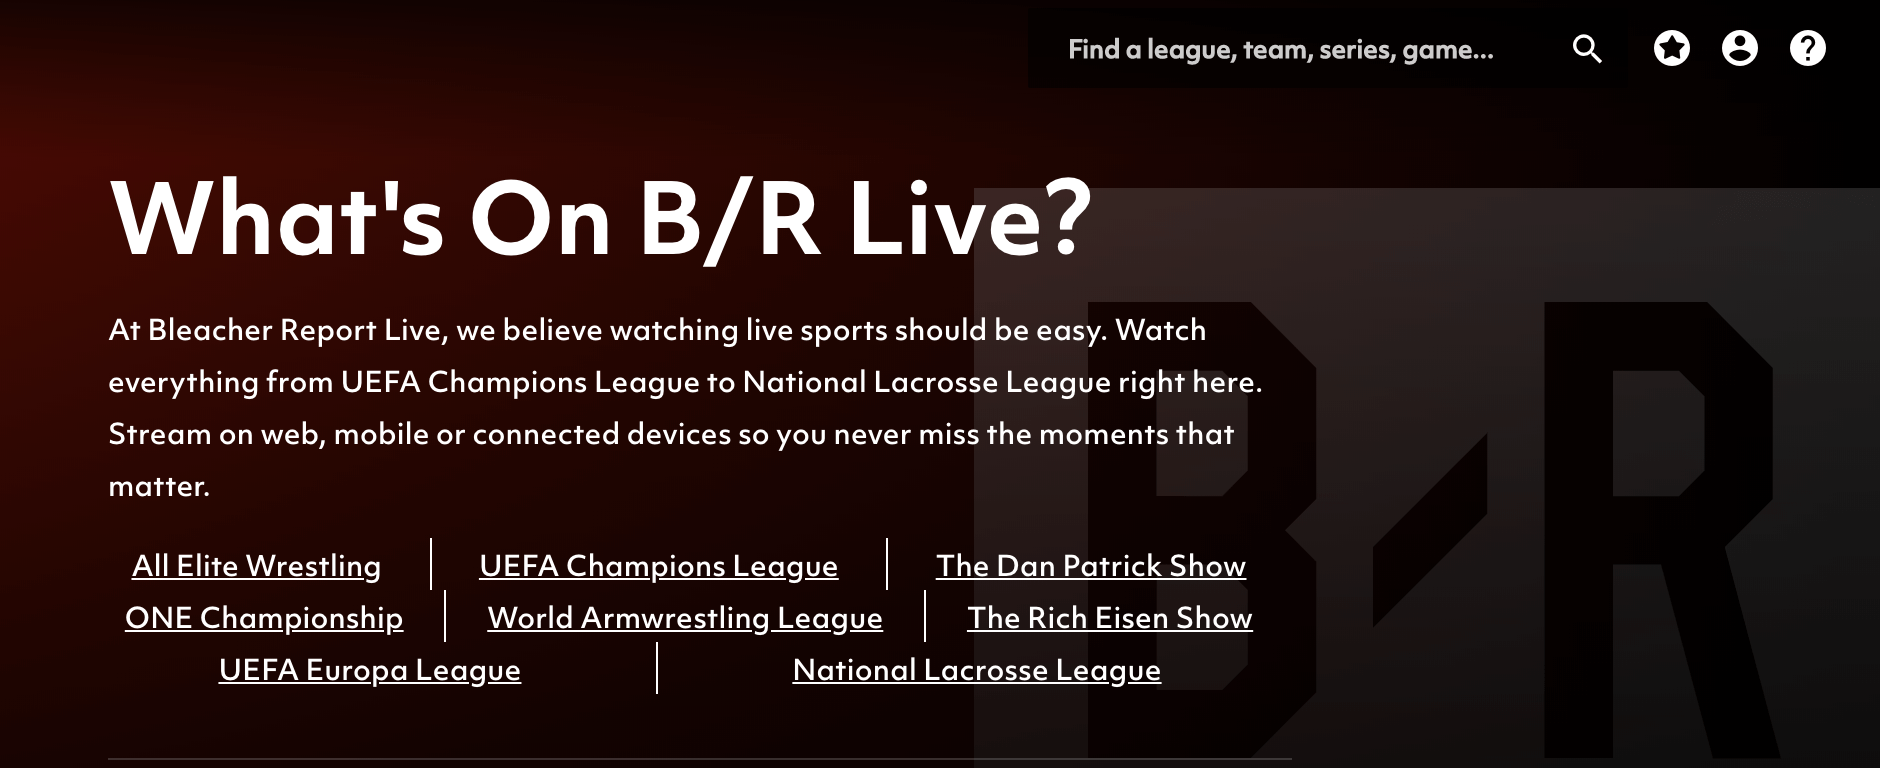 2019-20 uefa champions league draw soccer live stream b-r live